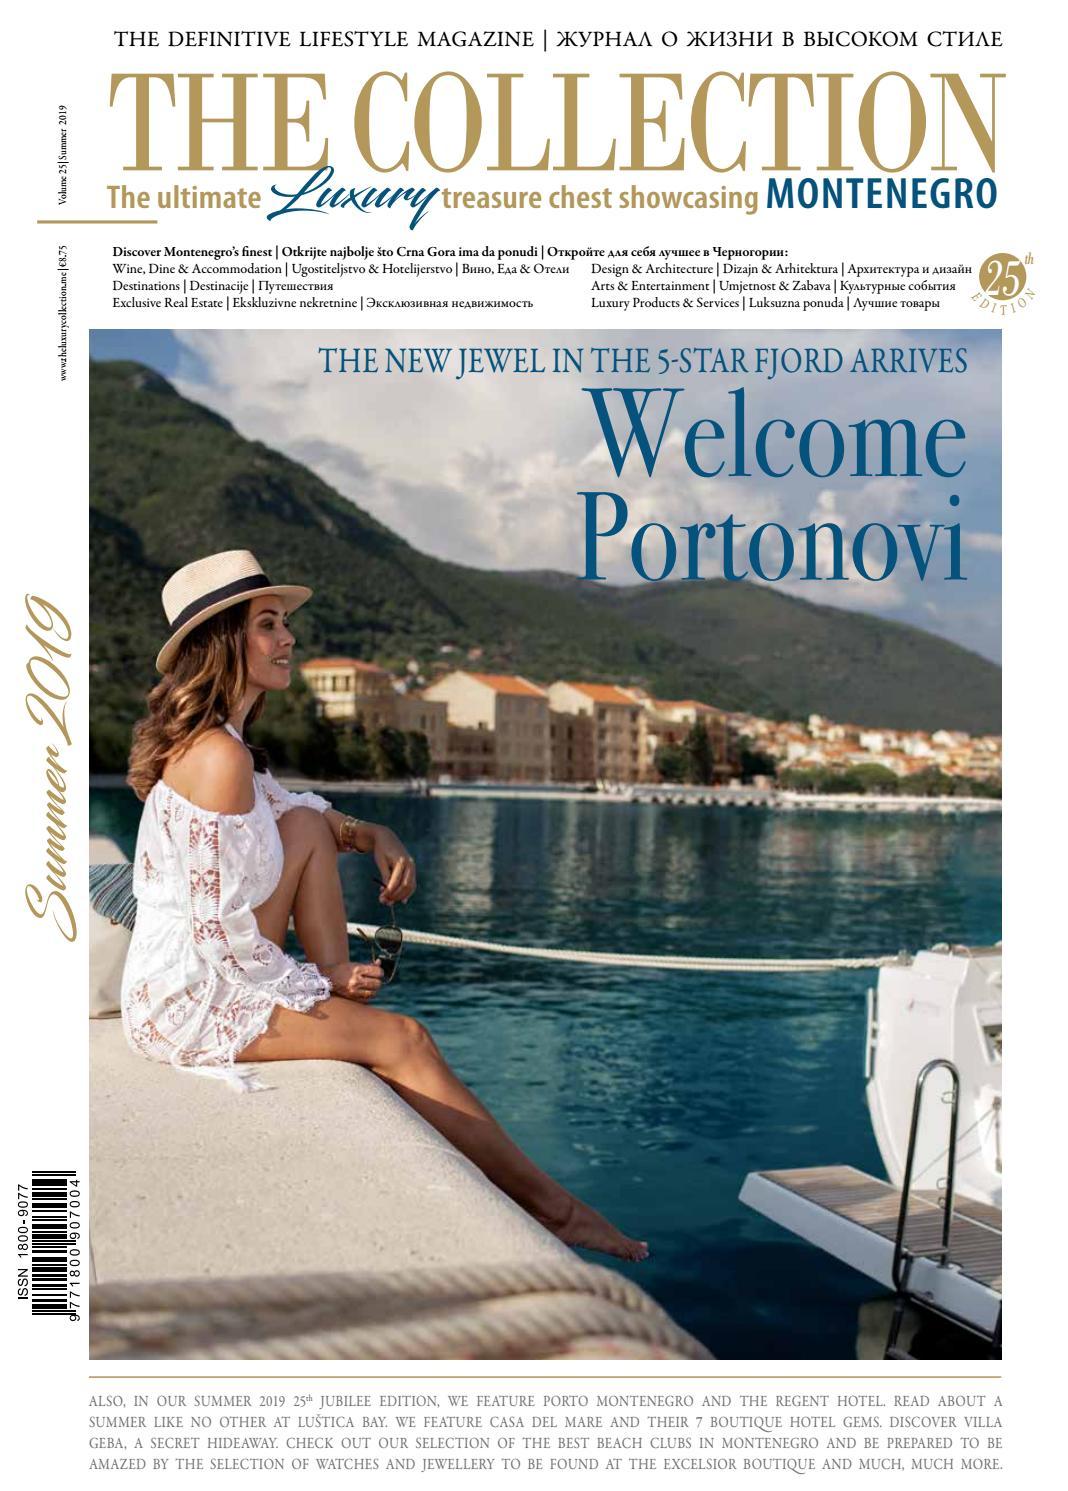 Andrea Montenegro En Latin Lover the collection, montenegro vol. 25the collection